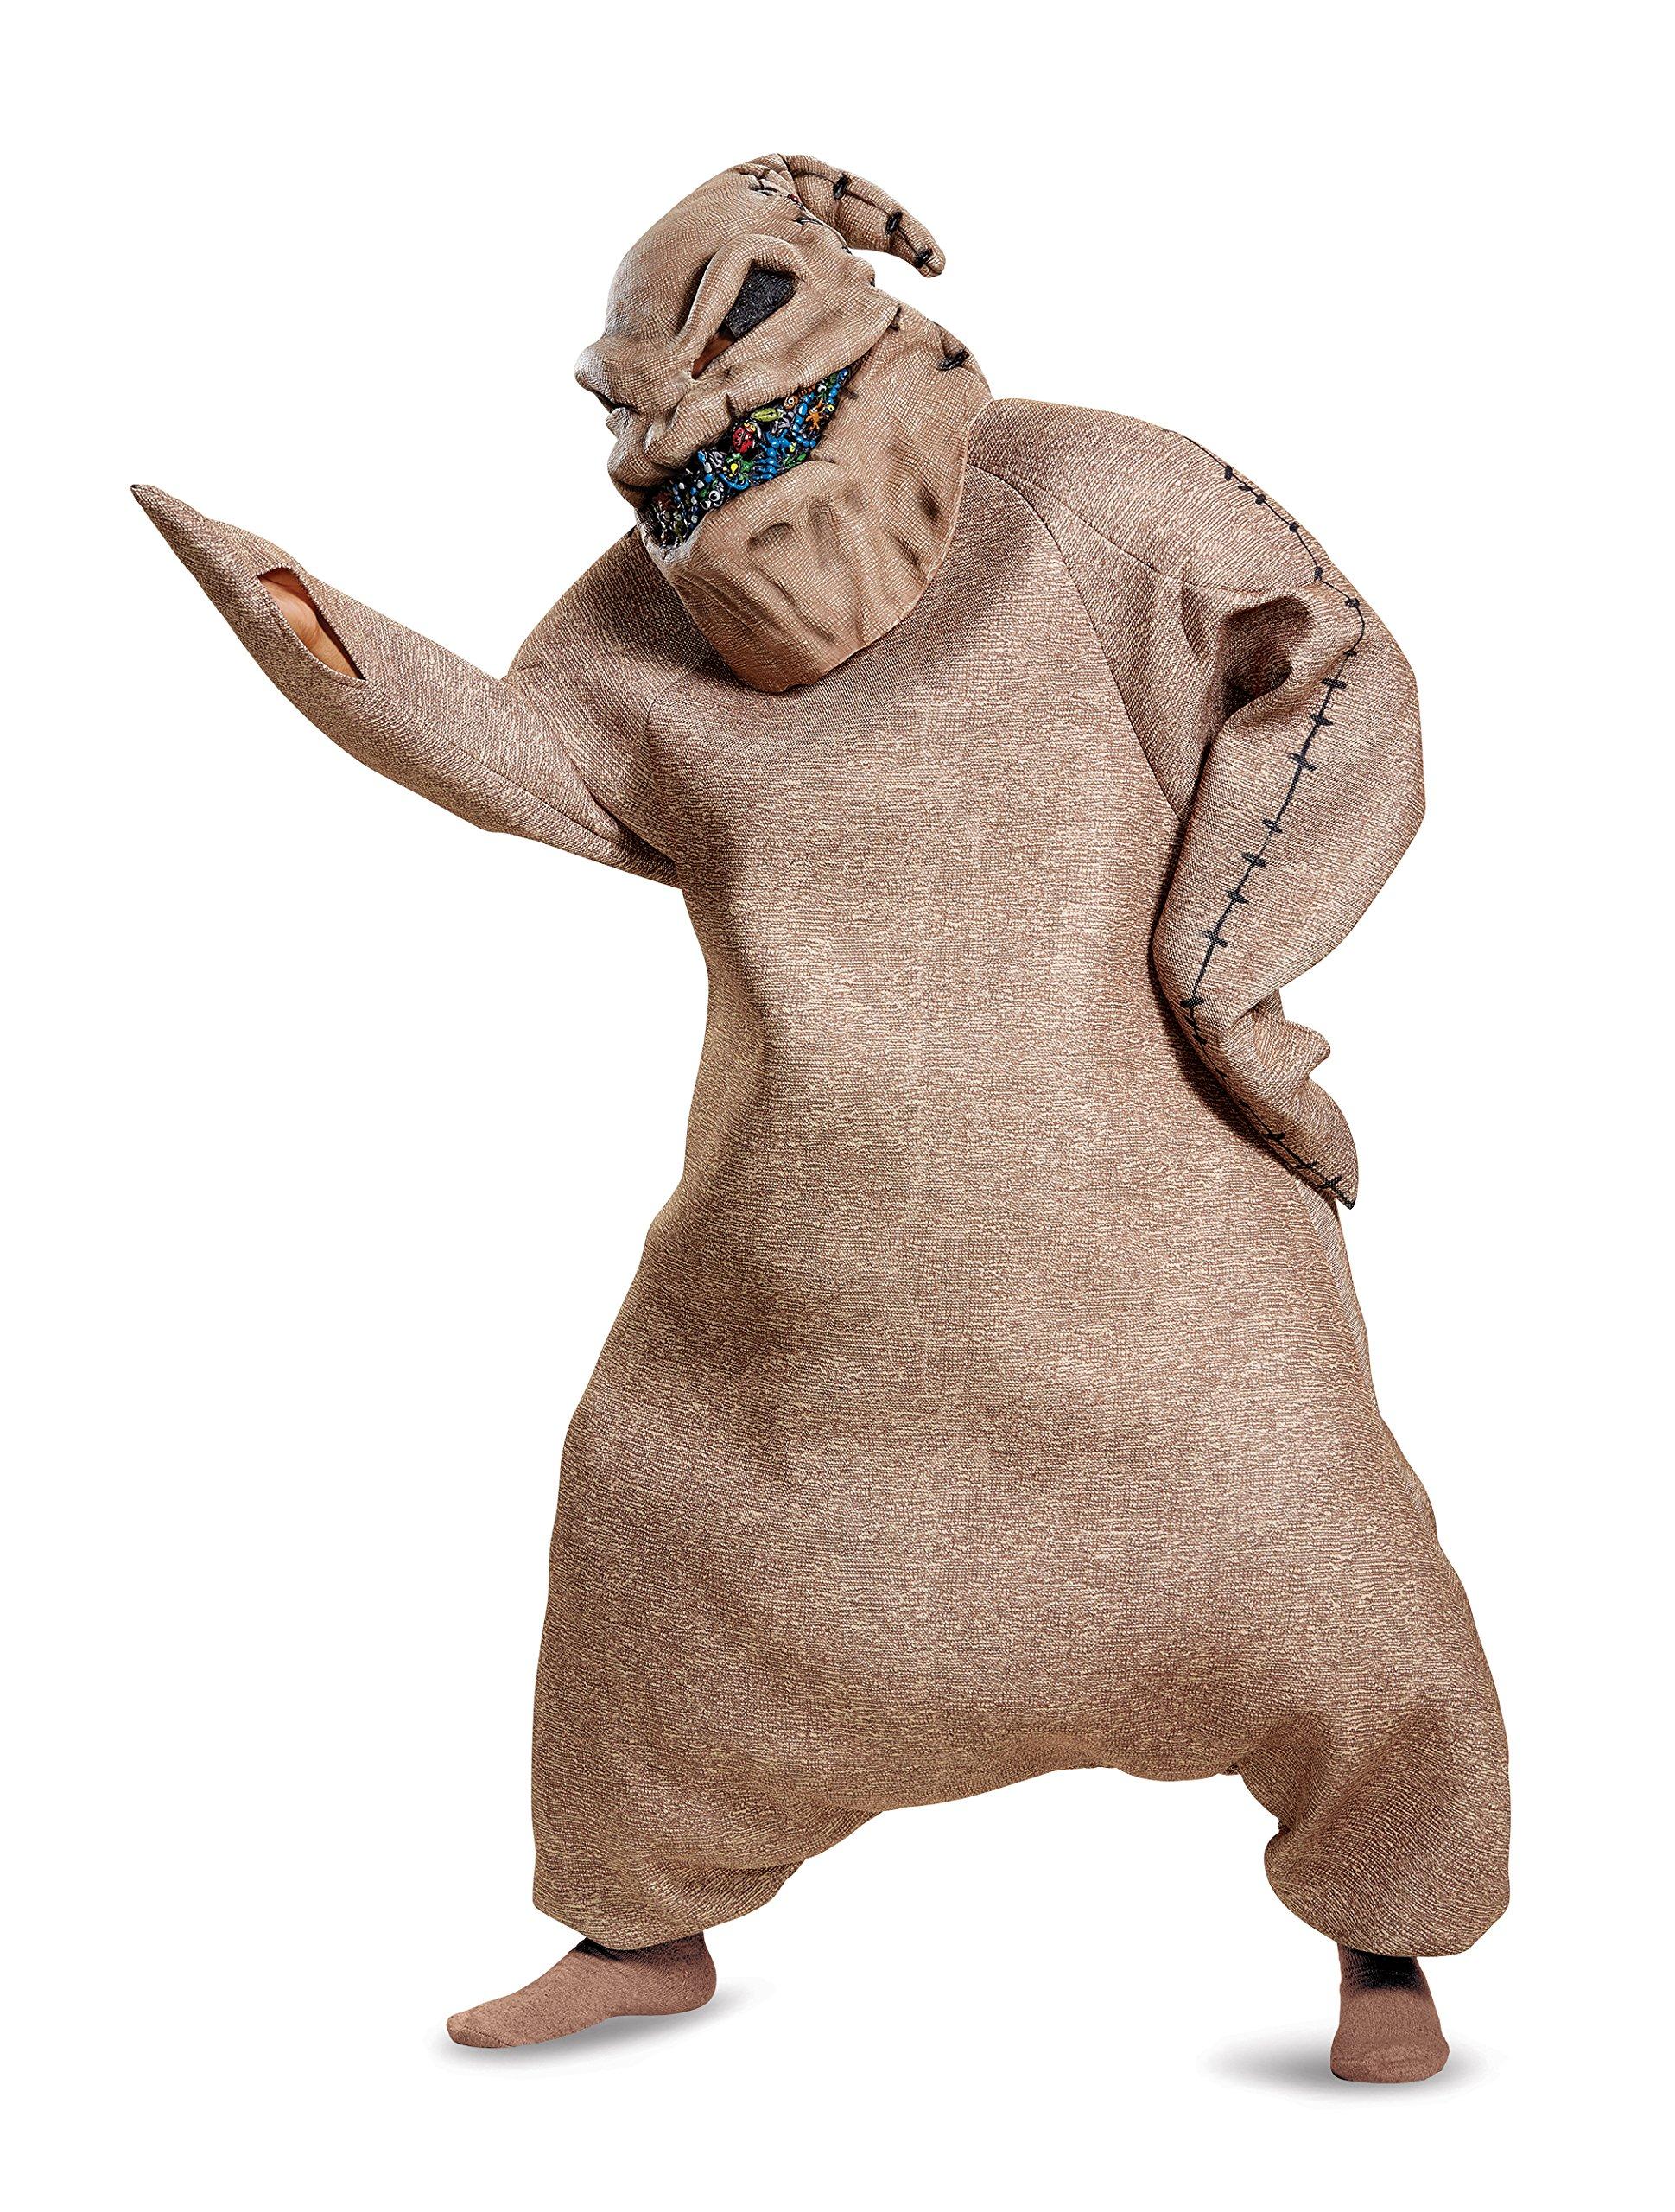 Disguise Men's Oogie Boogie Prestige Adult Costume, Brown, X-Large